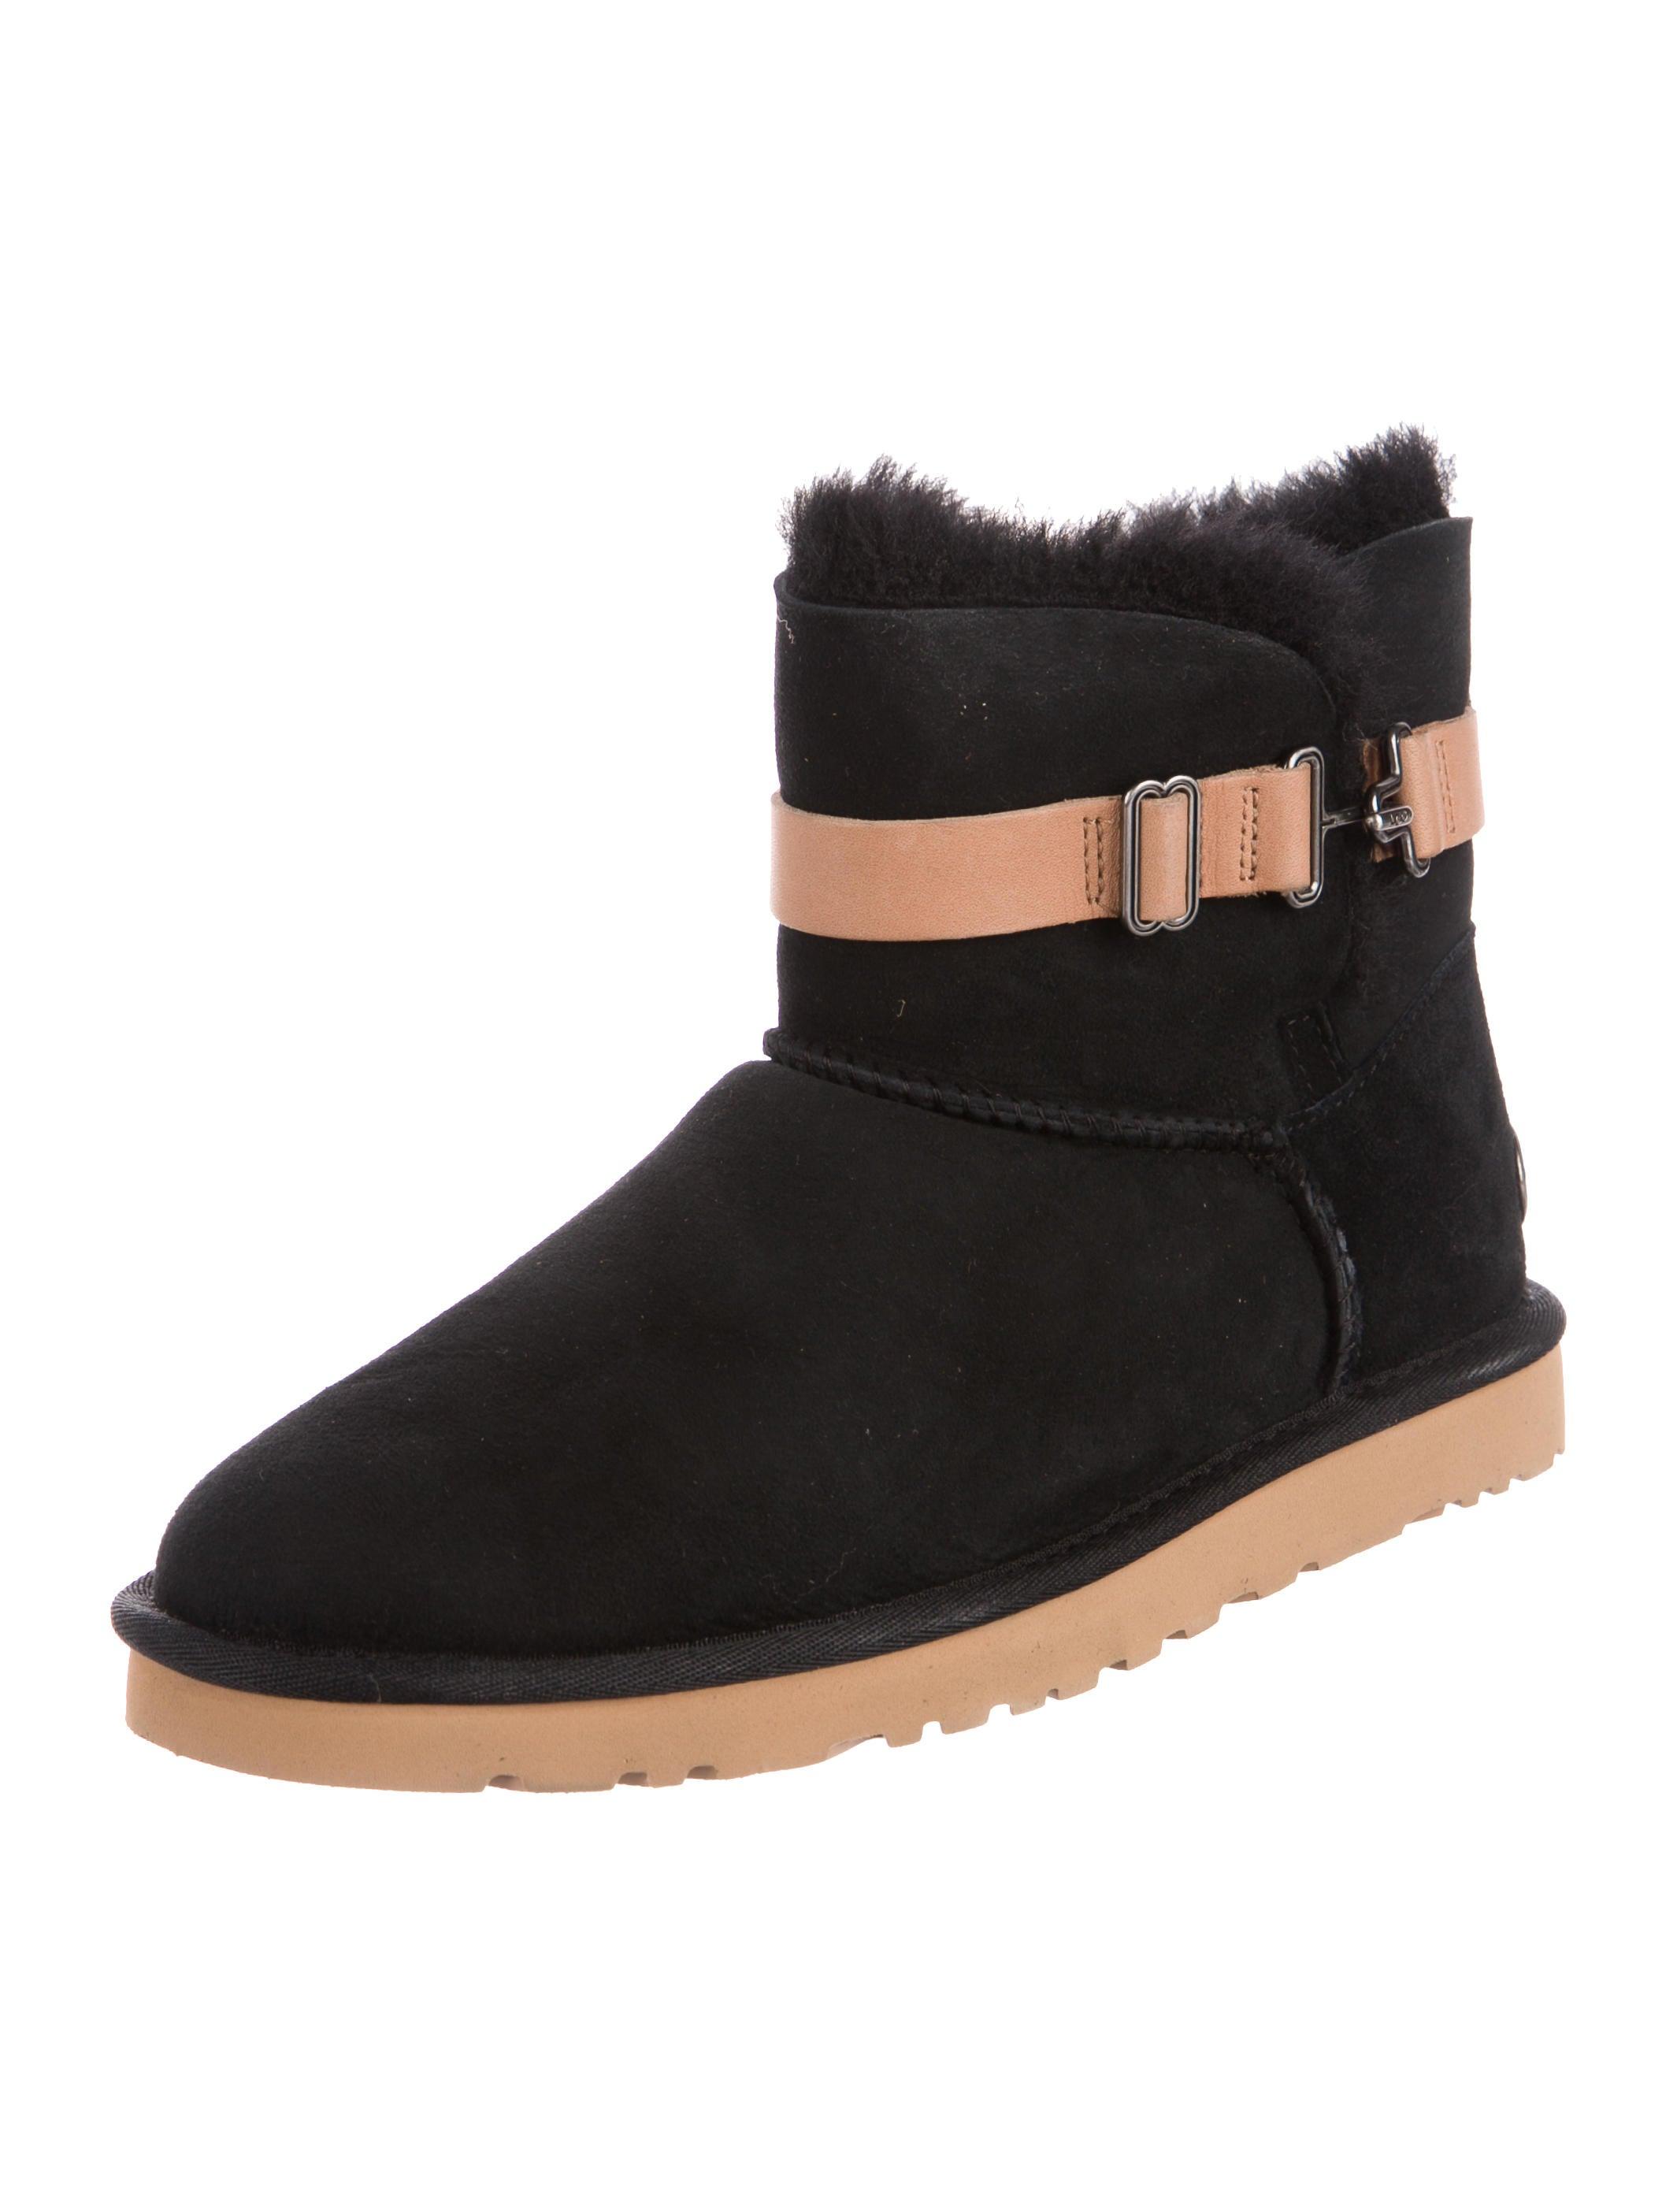 ugg australia suede toe boots shoes wuugg23094